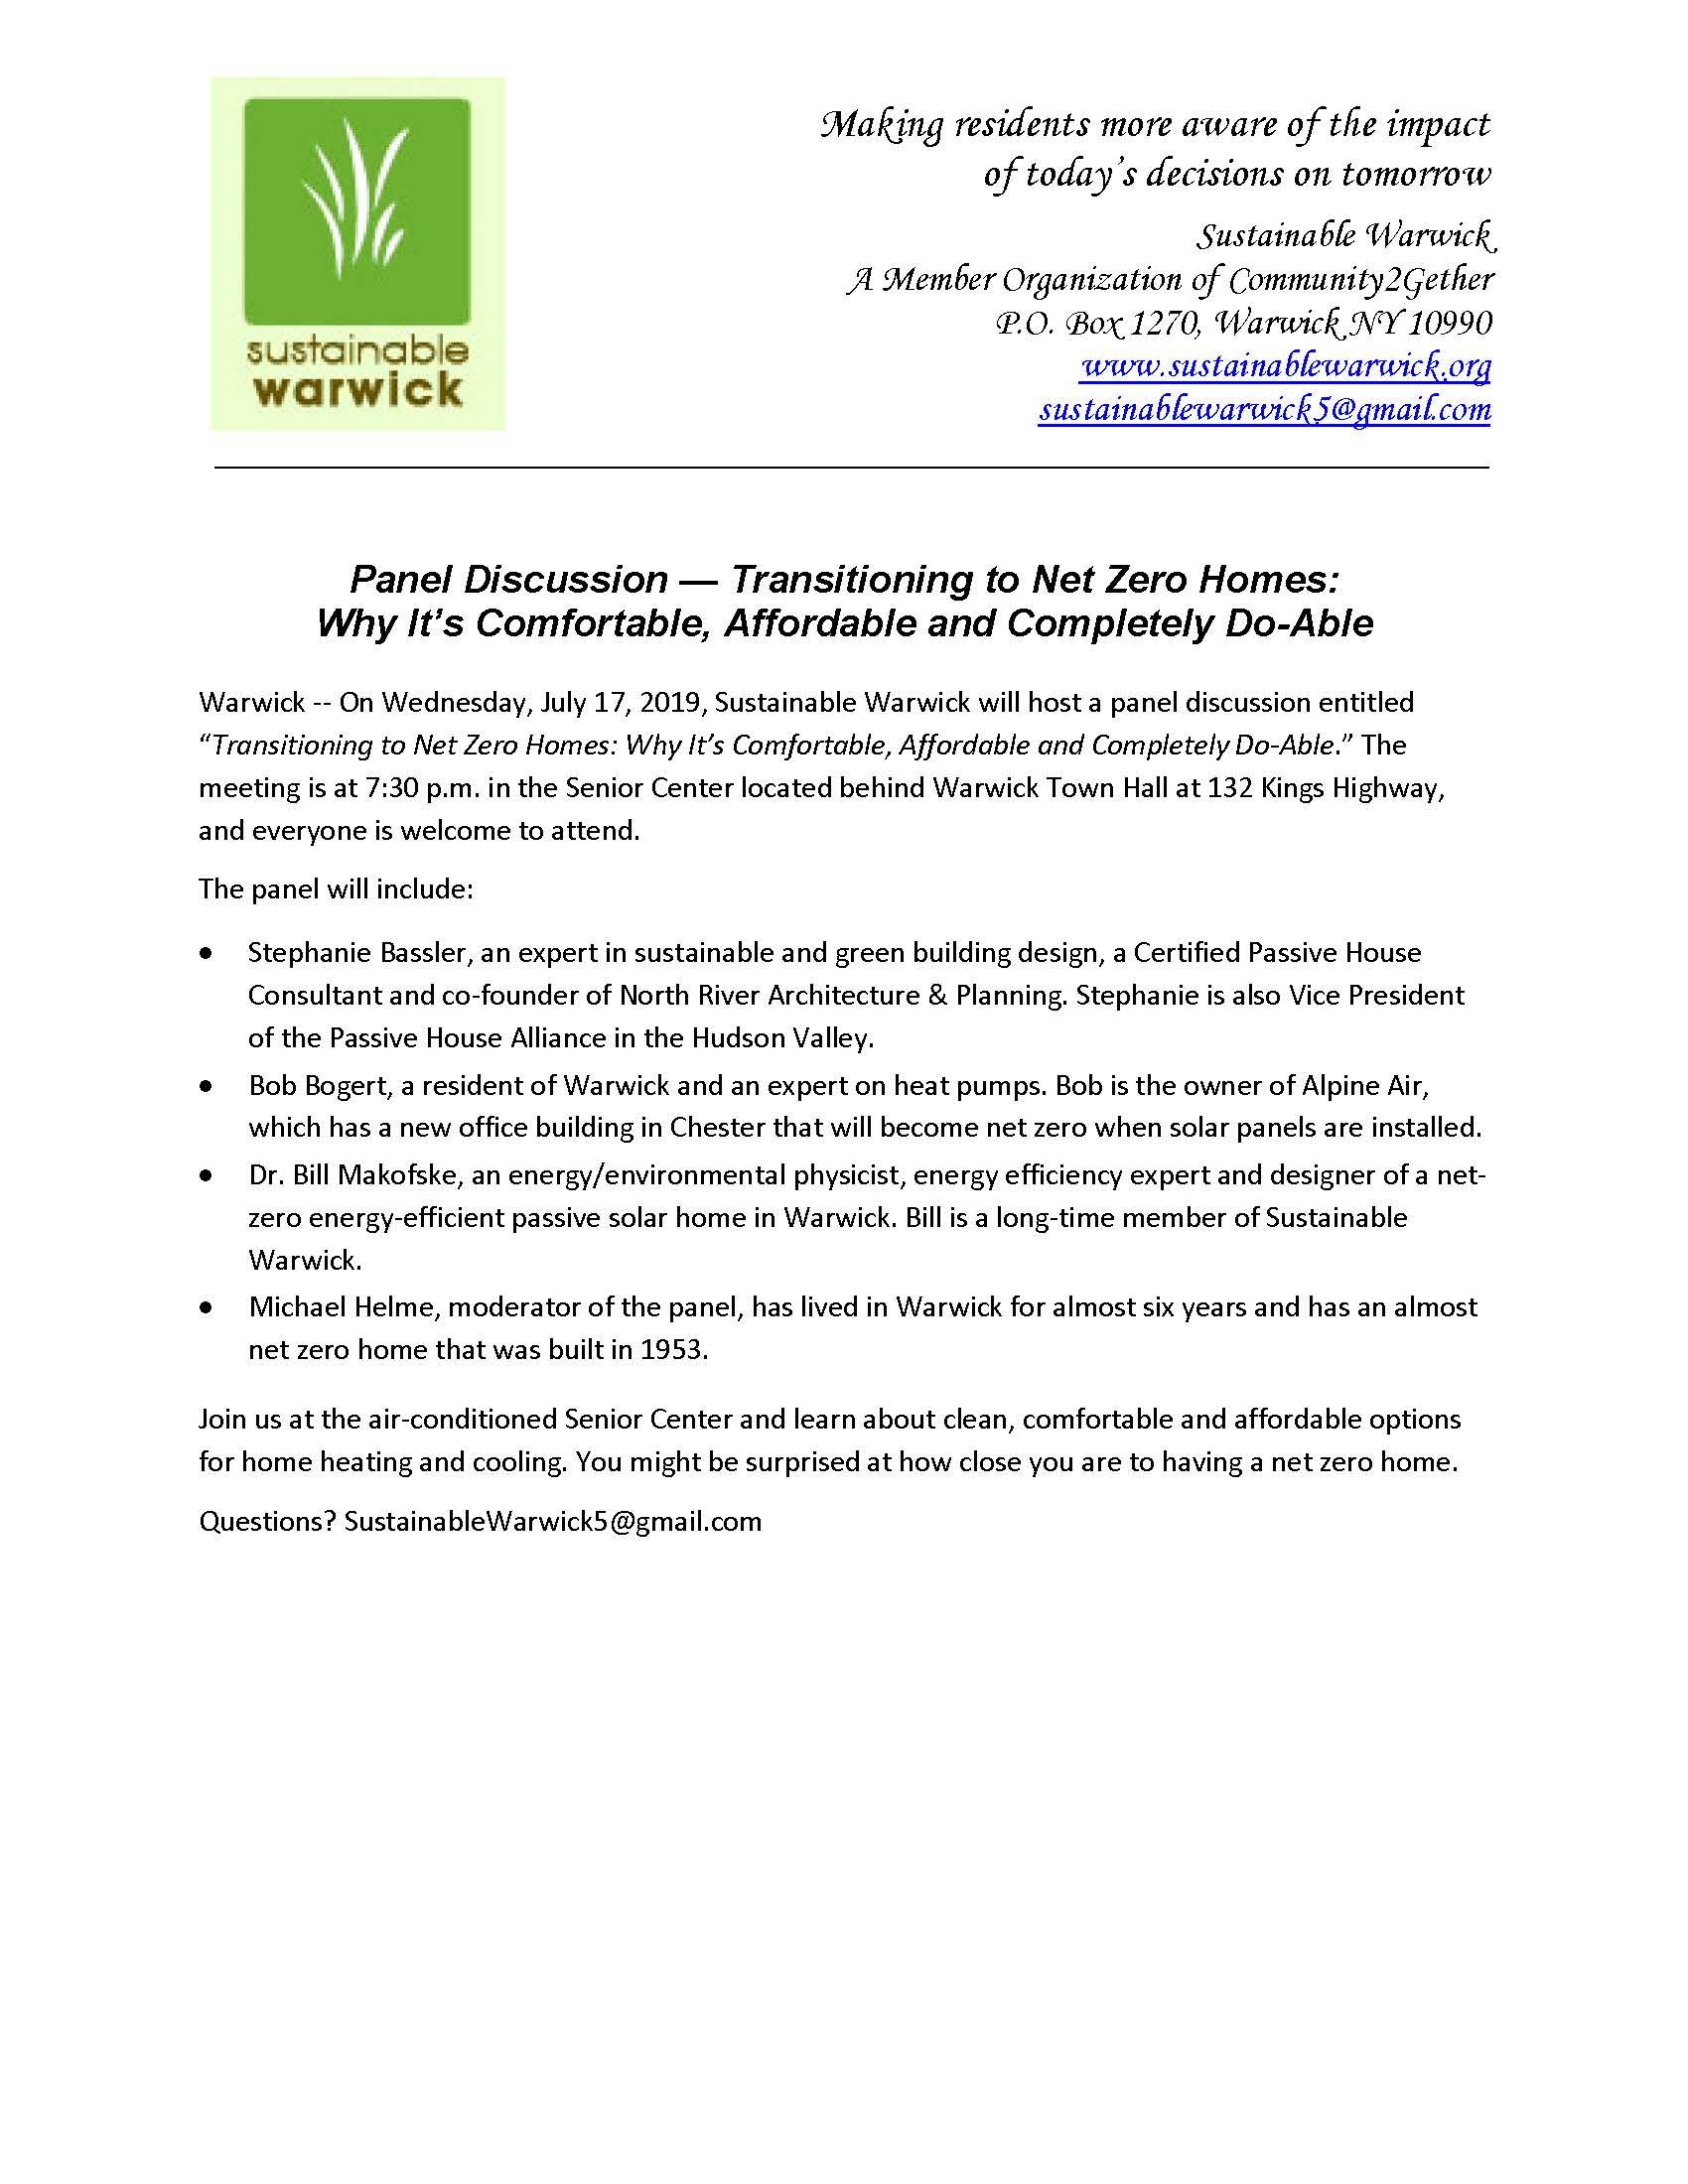 NRAP Sustainable Warwick Net Zero Homes